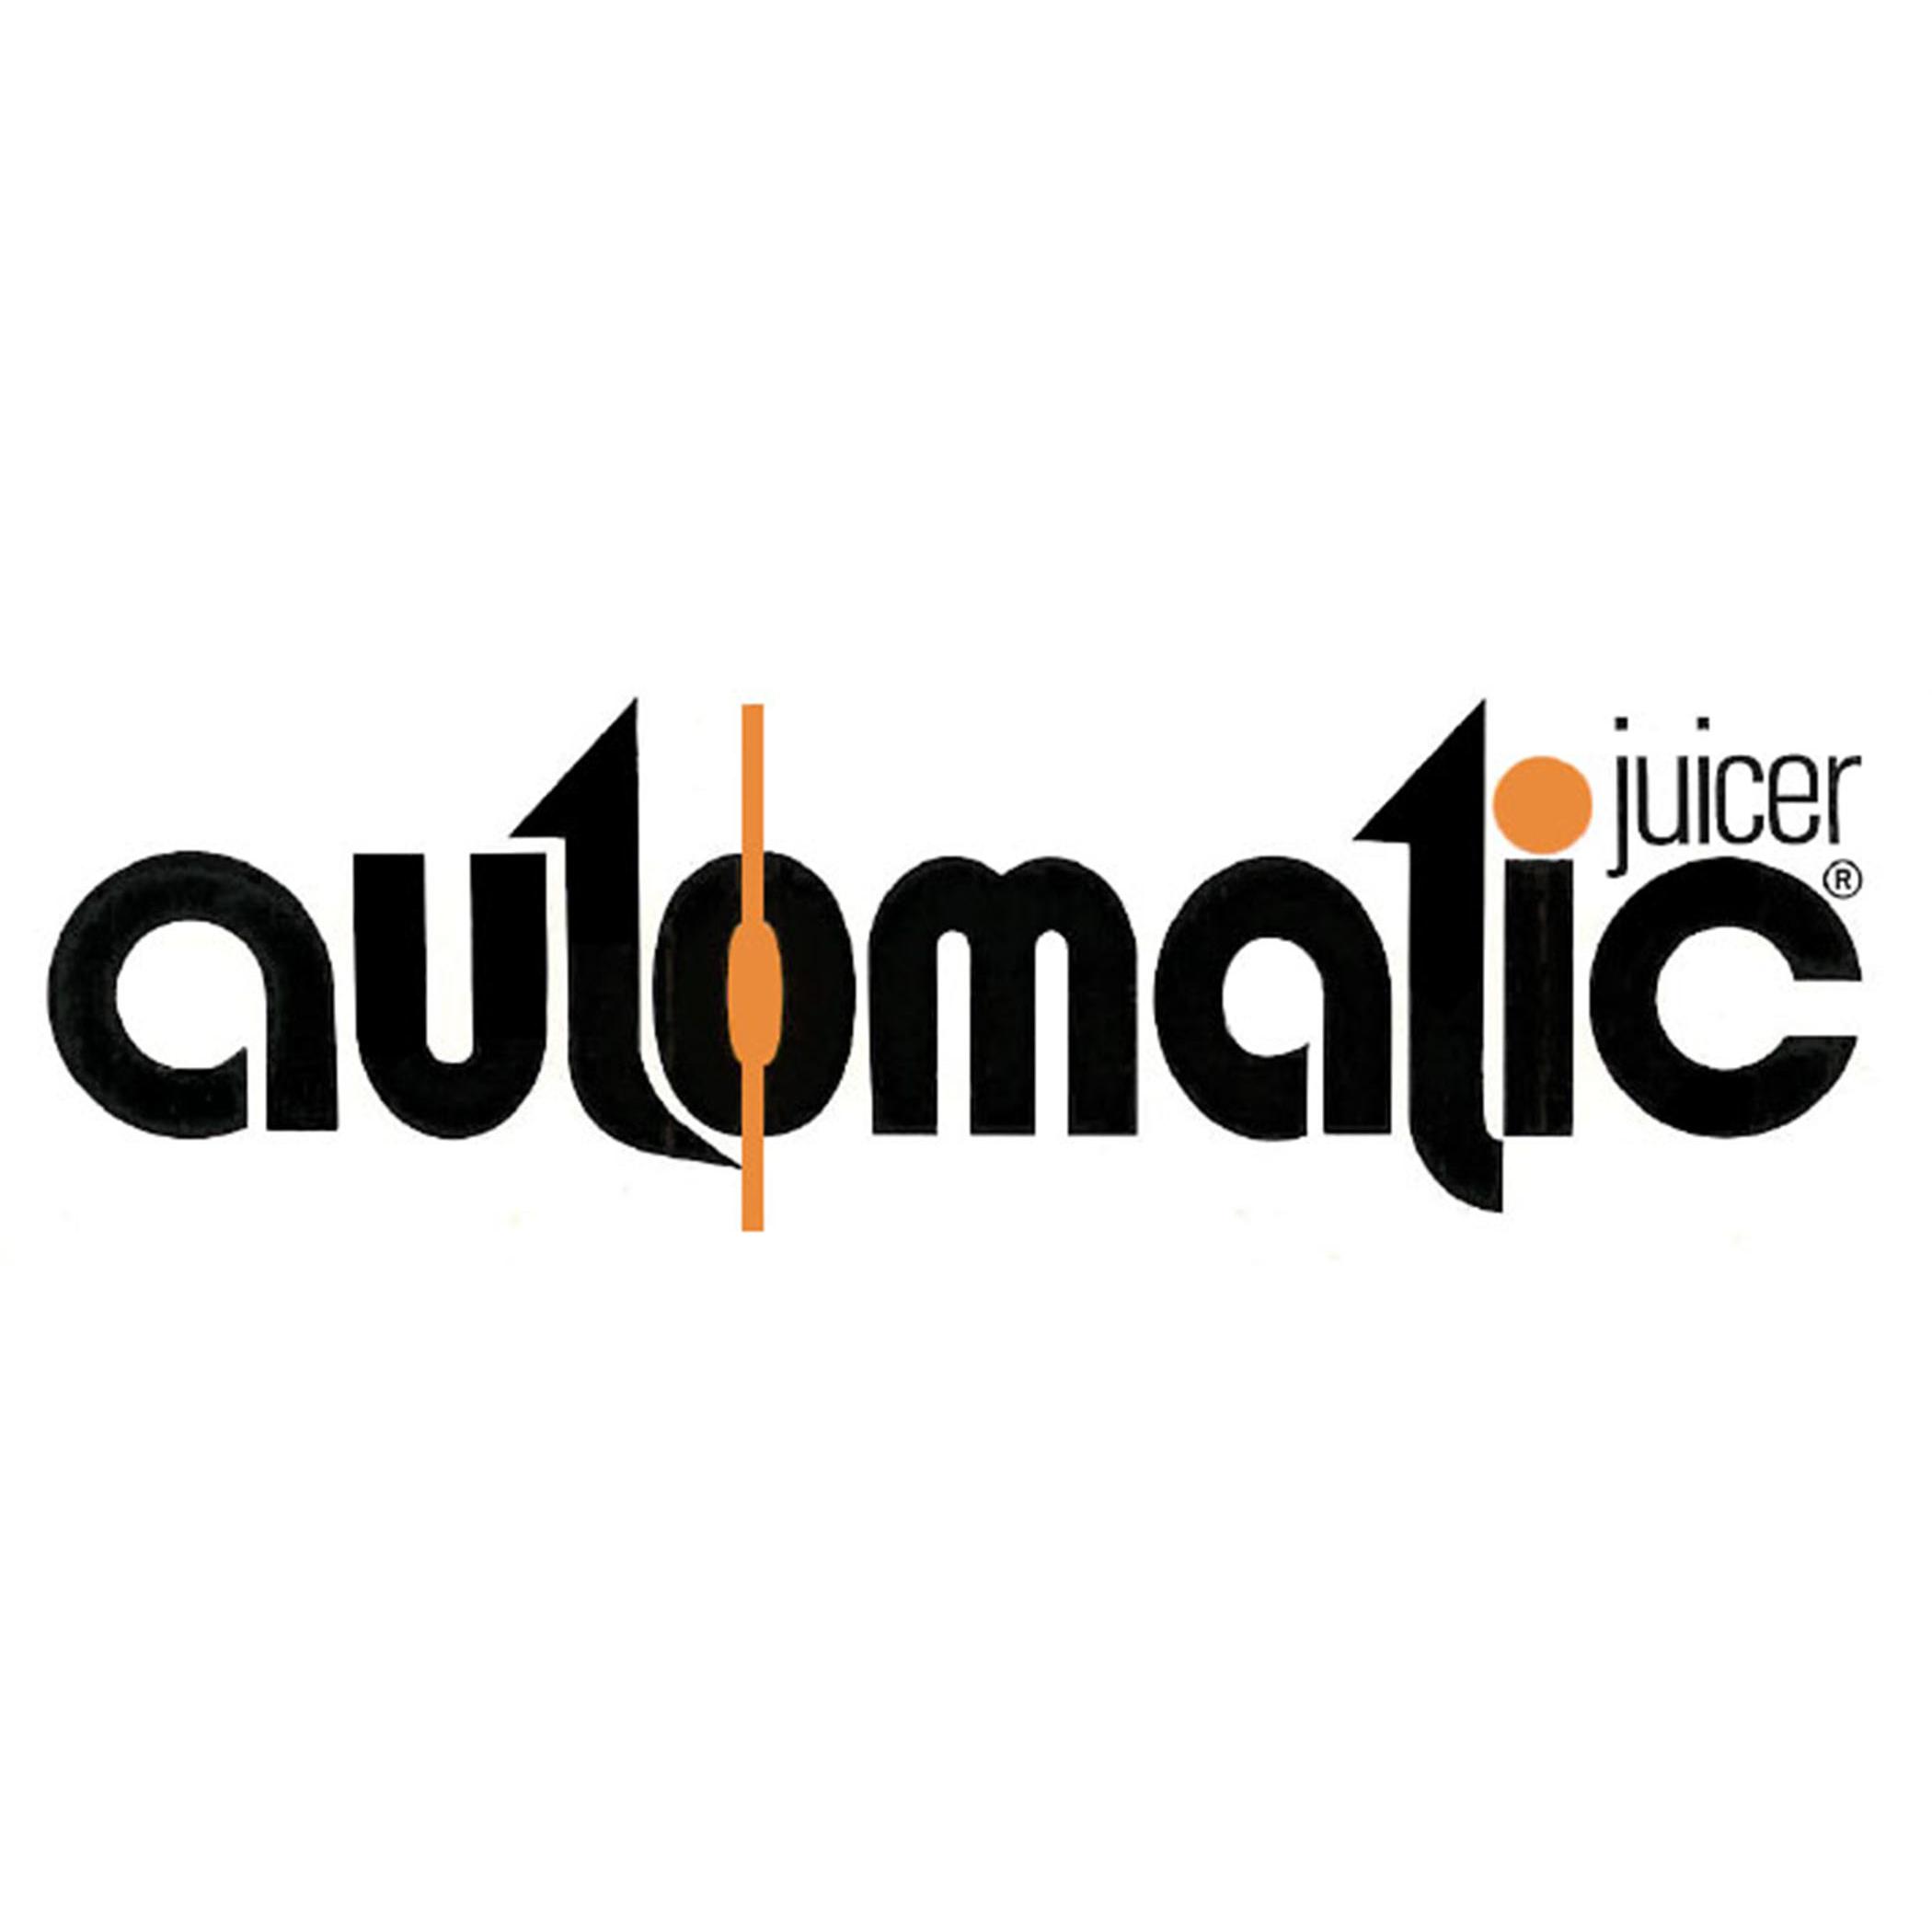 Automatic Juicer ®